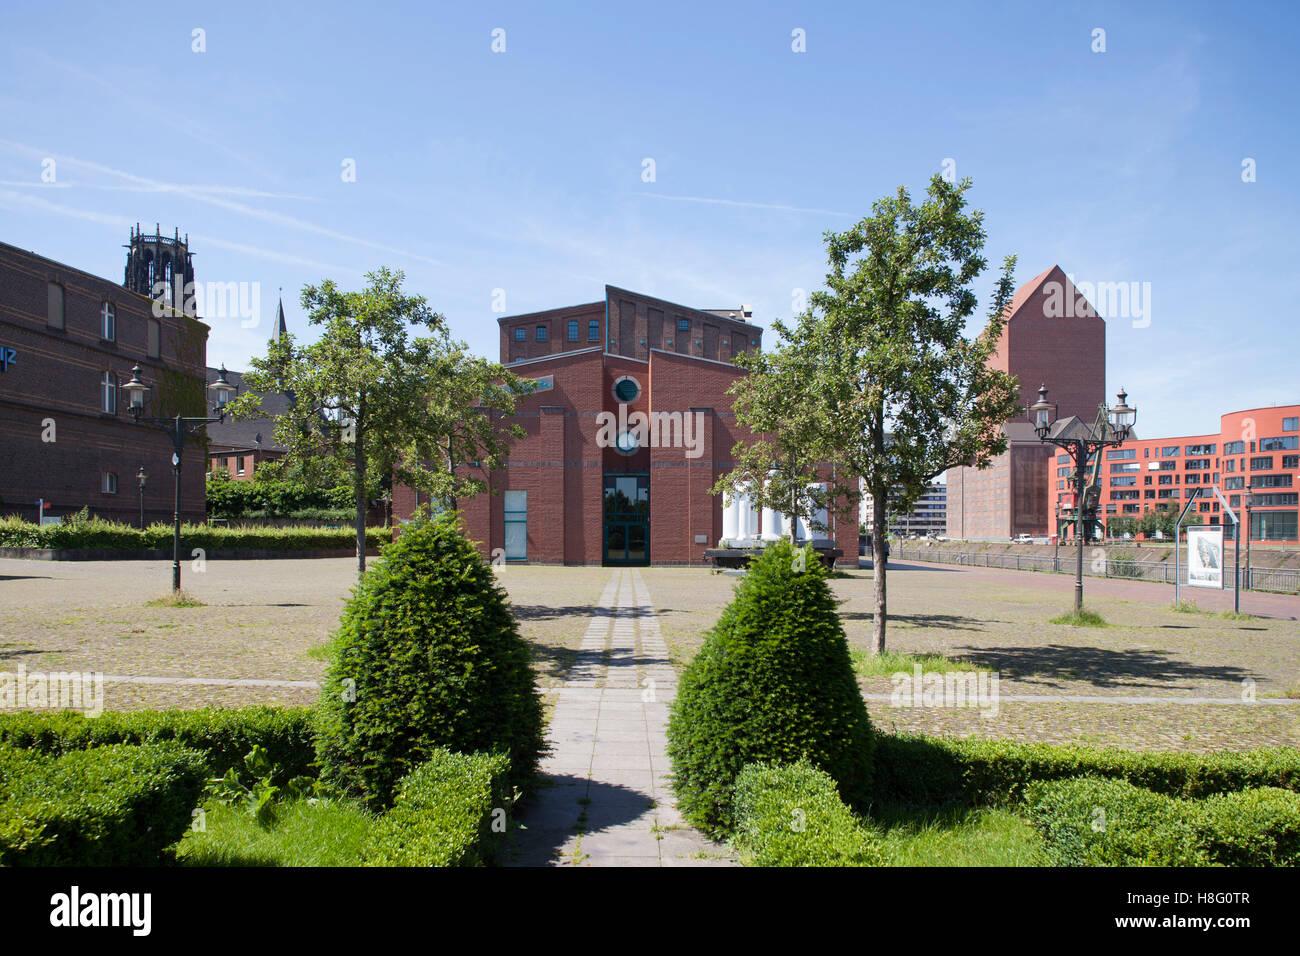 Garten der Erinnerung by Dani Karavan, inner harbour, Duisburg, Ruhr area, North Rhine-Westphalia, Germany, Europe - Stock Image